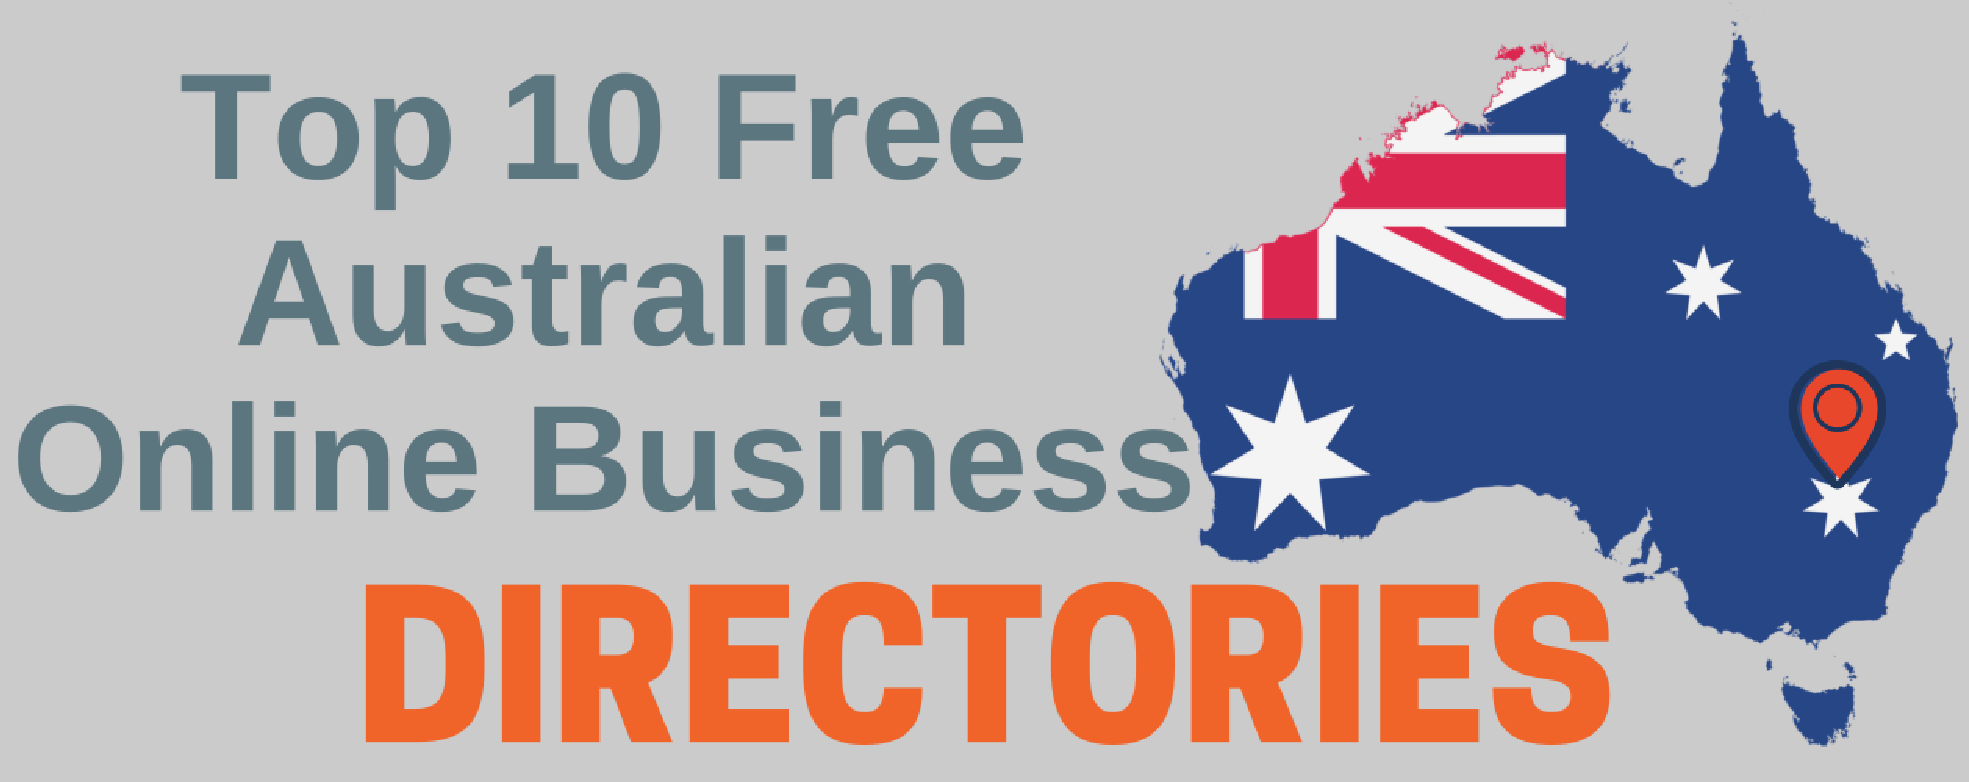 Australian free business listings